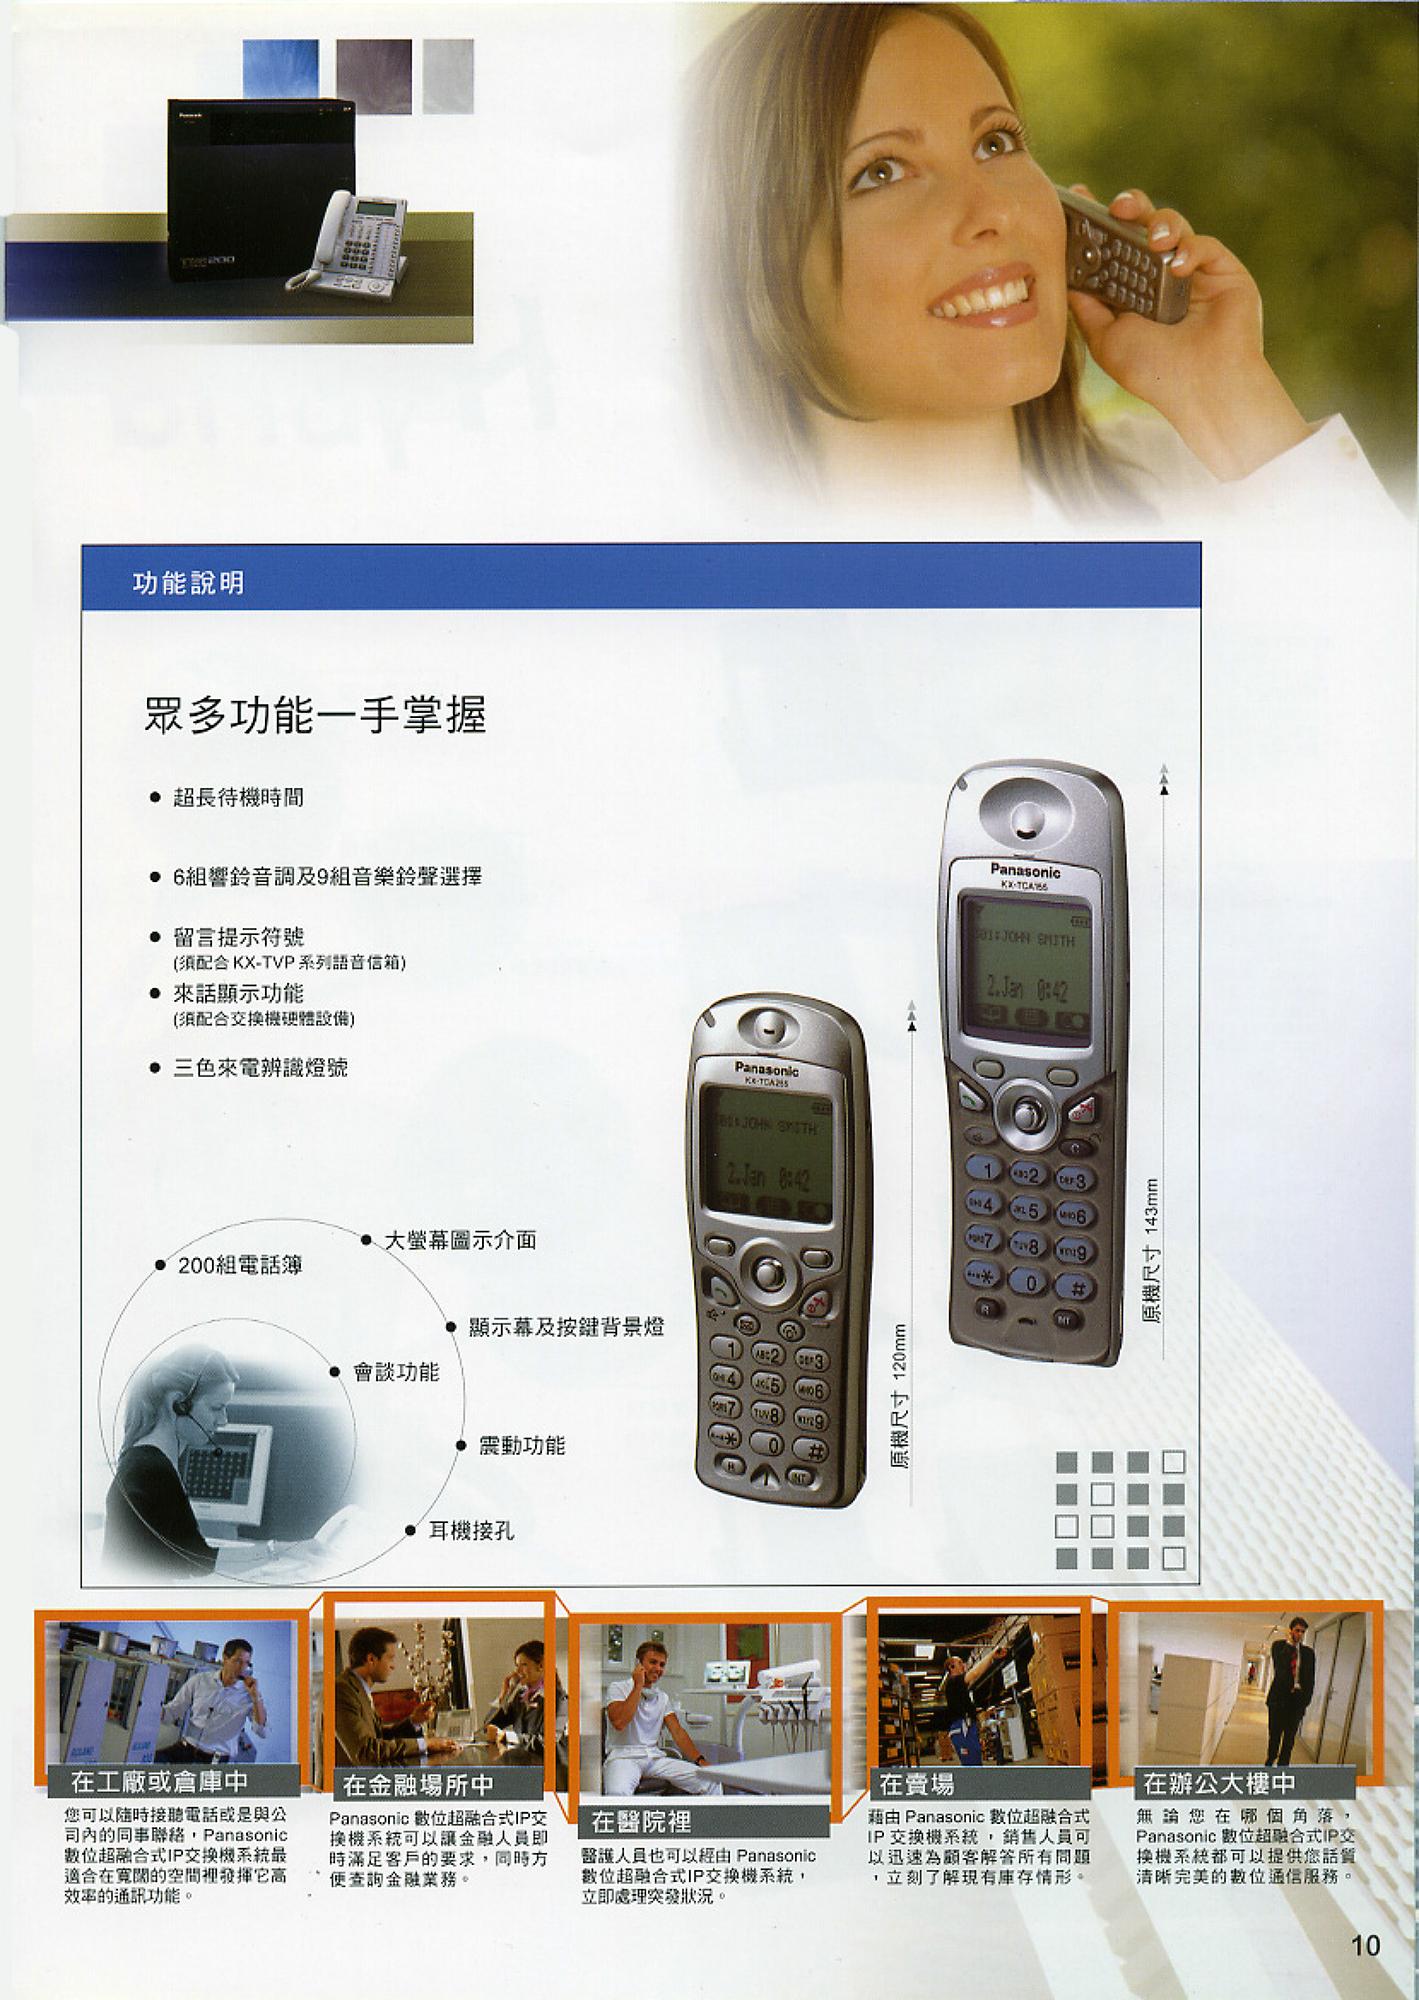 KX-TDA數位超融合式IP交換機-11.jpg